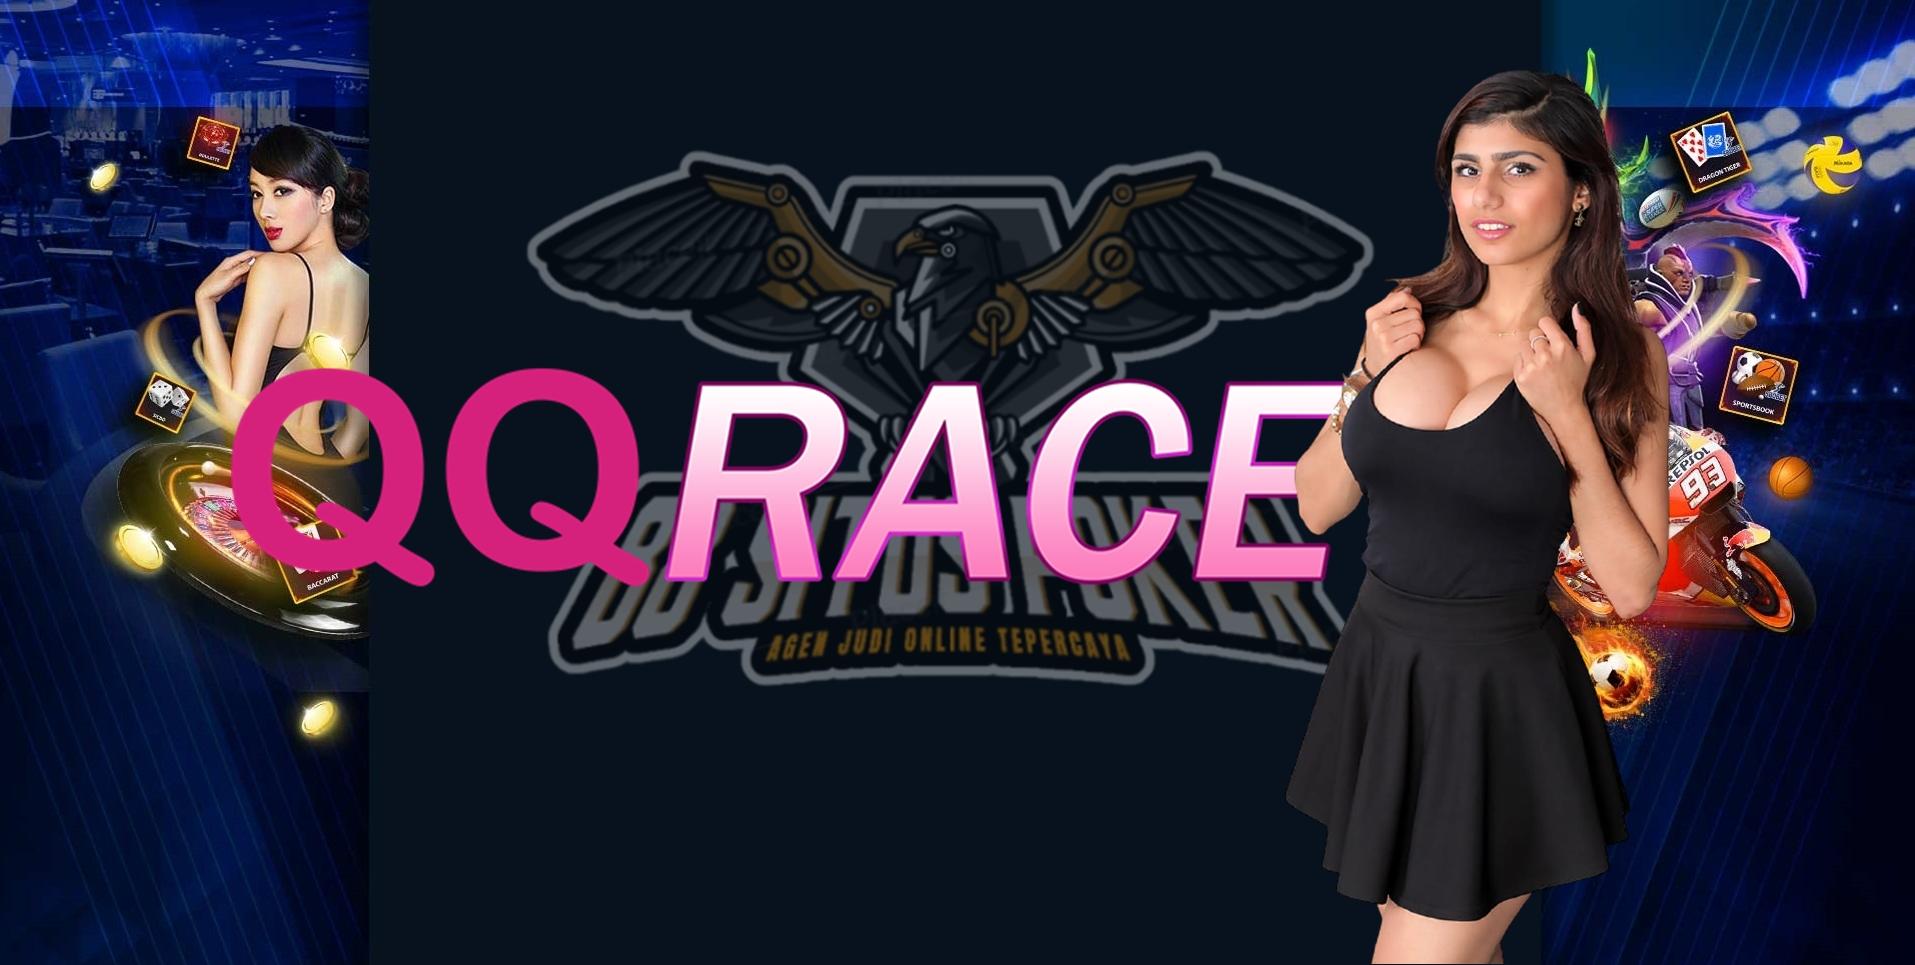 QQrace Situs Judi Slot Online Terbesar